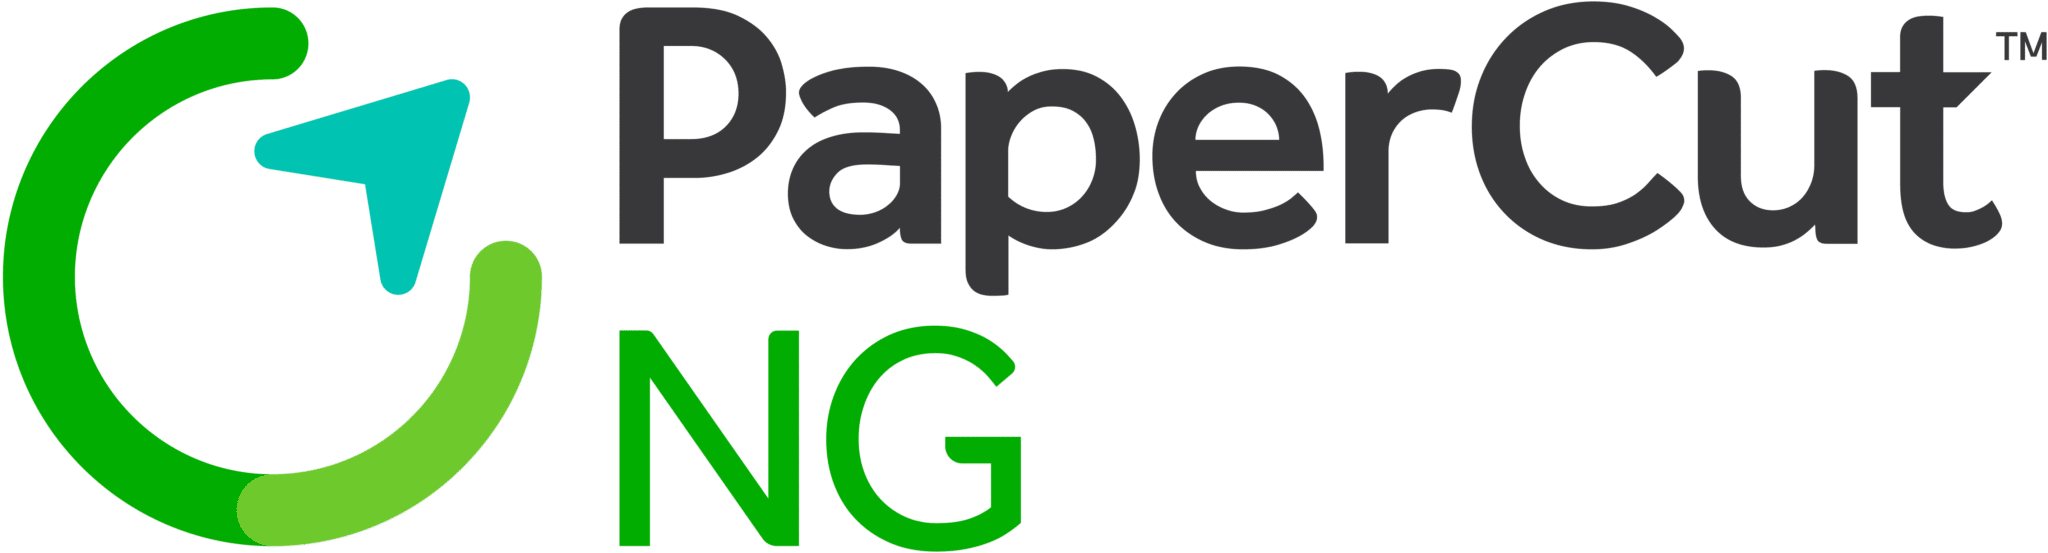 PaperCut sikker udprint